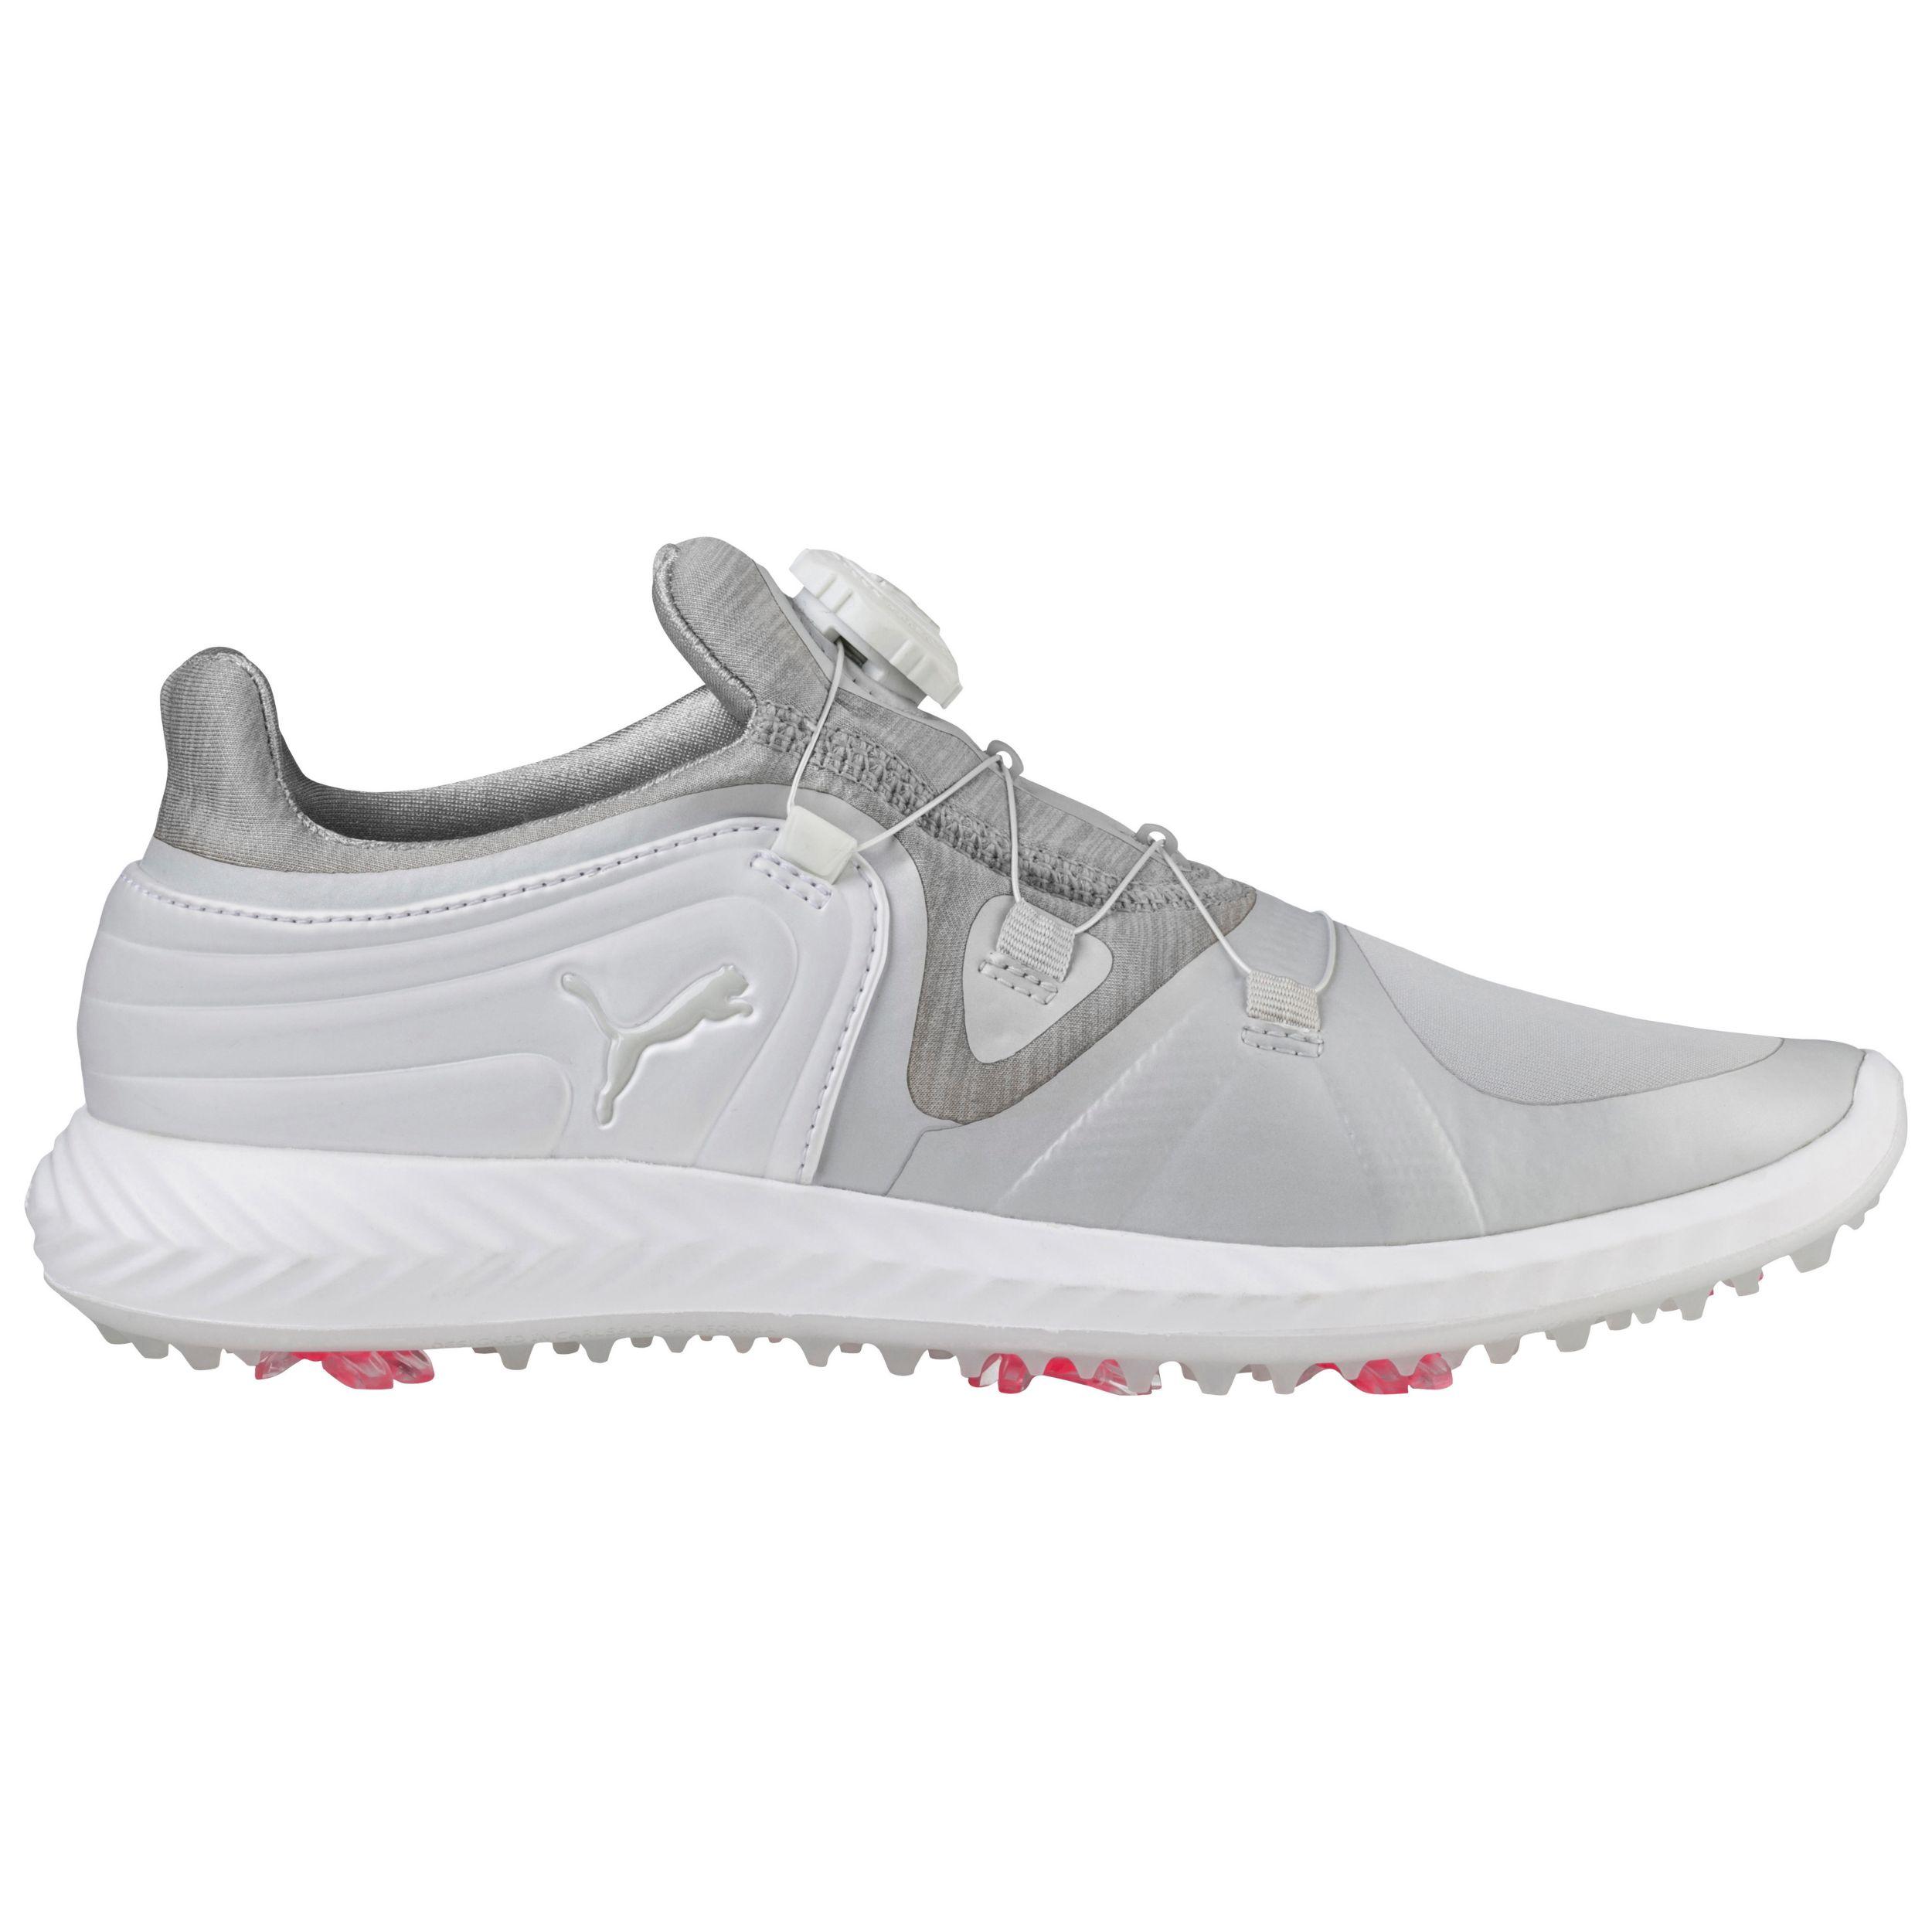 8d0feca2c17 Puma Golf- Ladies IGNITE Blaze Sport Disc Shoes